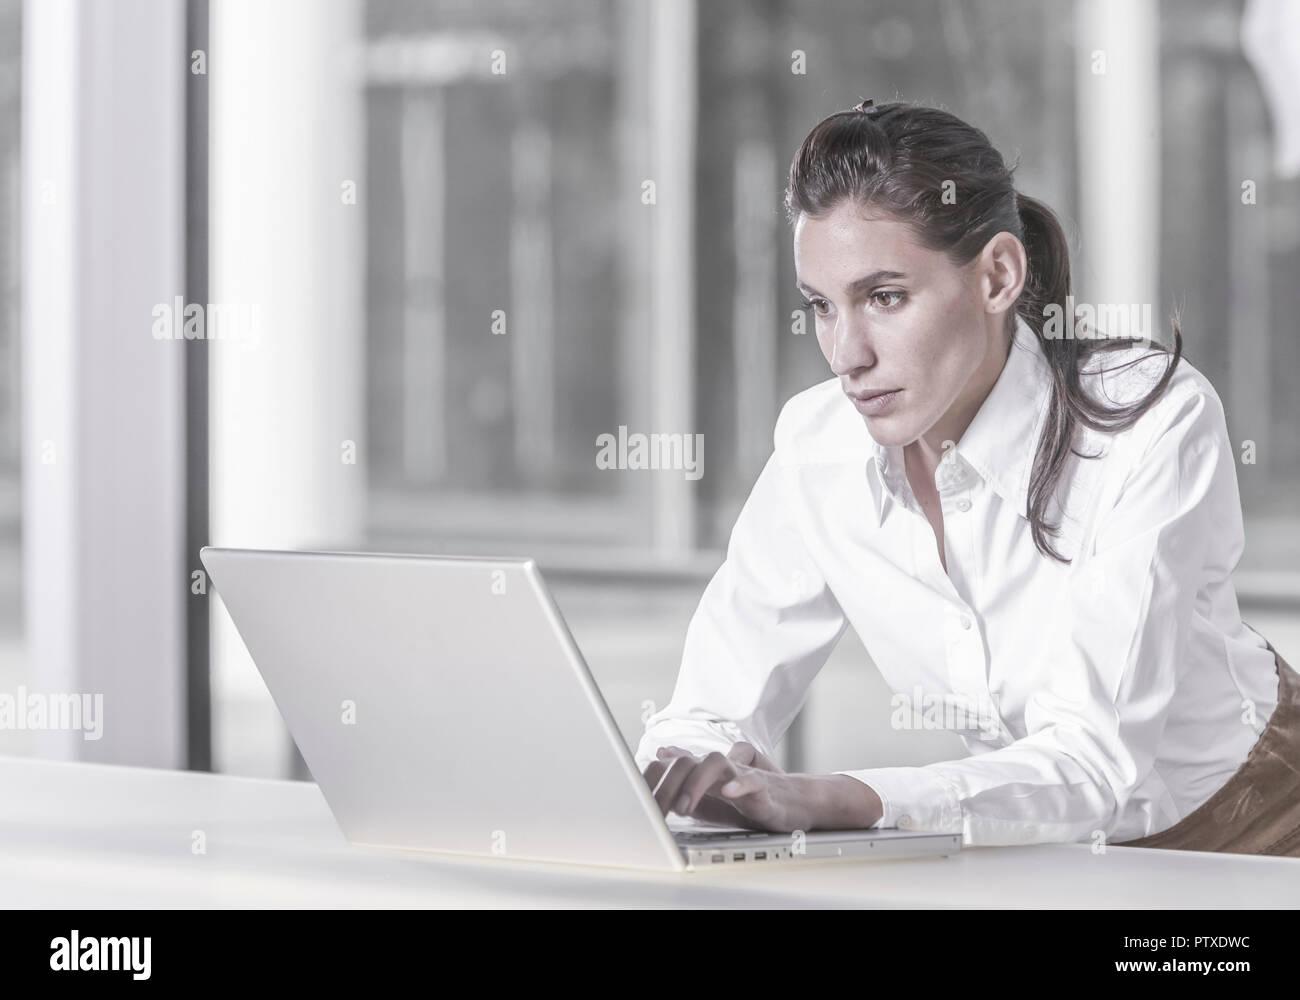 Frau im Buero an Laptop (model-released) - Stock Image